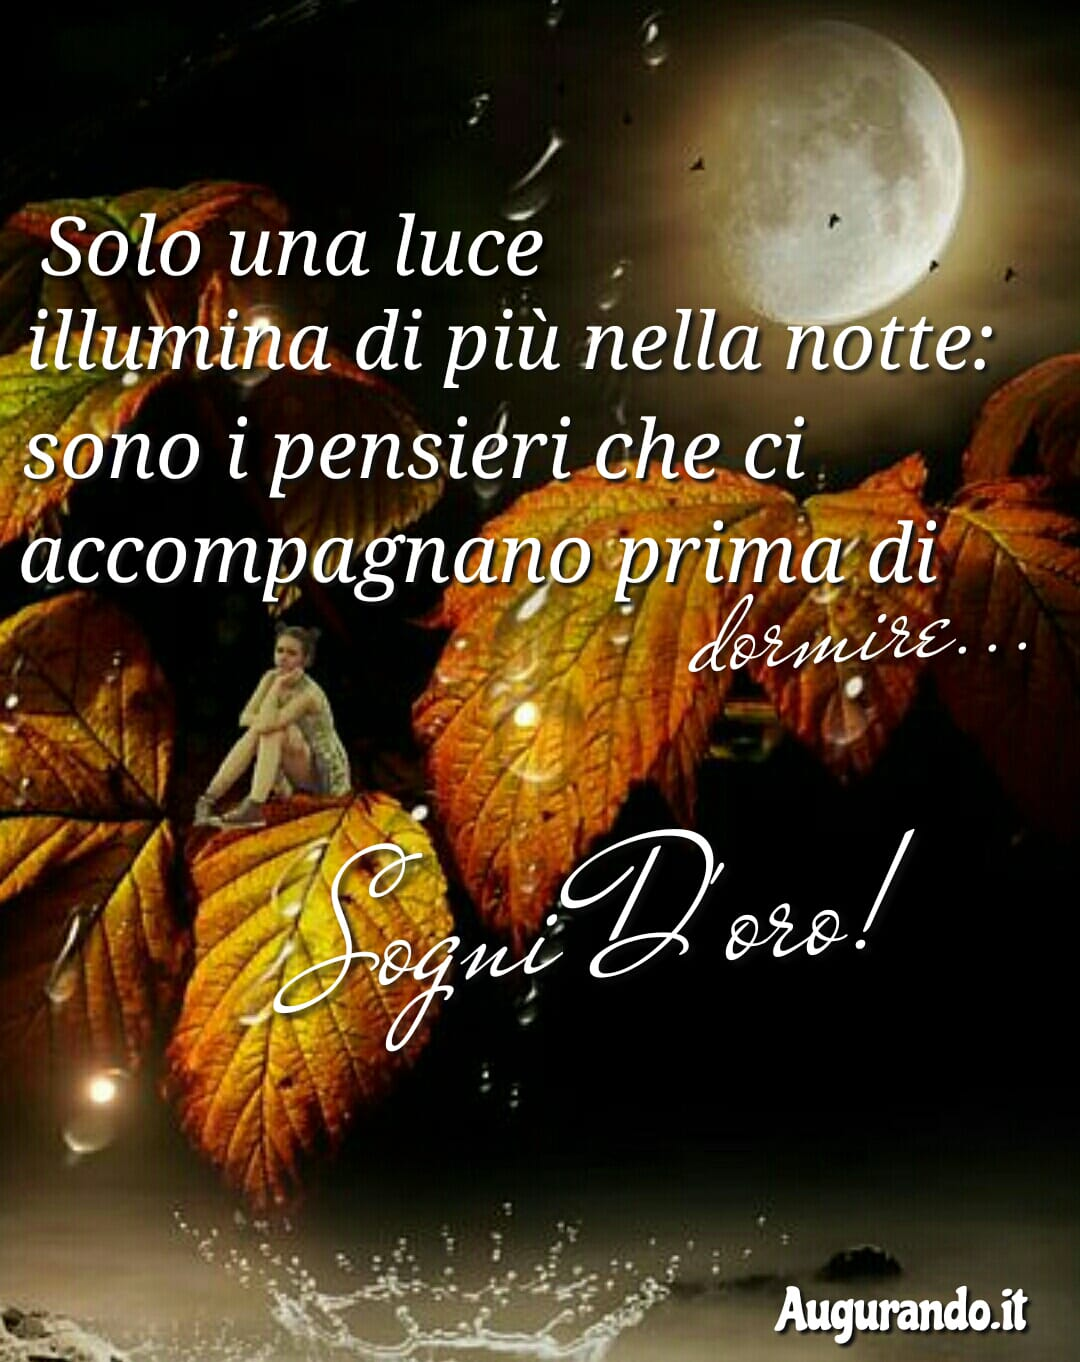 Buona notte, notte, dolce notte, dolcissima notte, serena notte, felice notte, sogni d'oro, dolci sogni, sogni, felici sogni